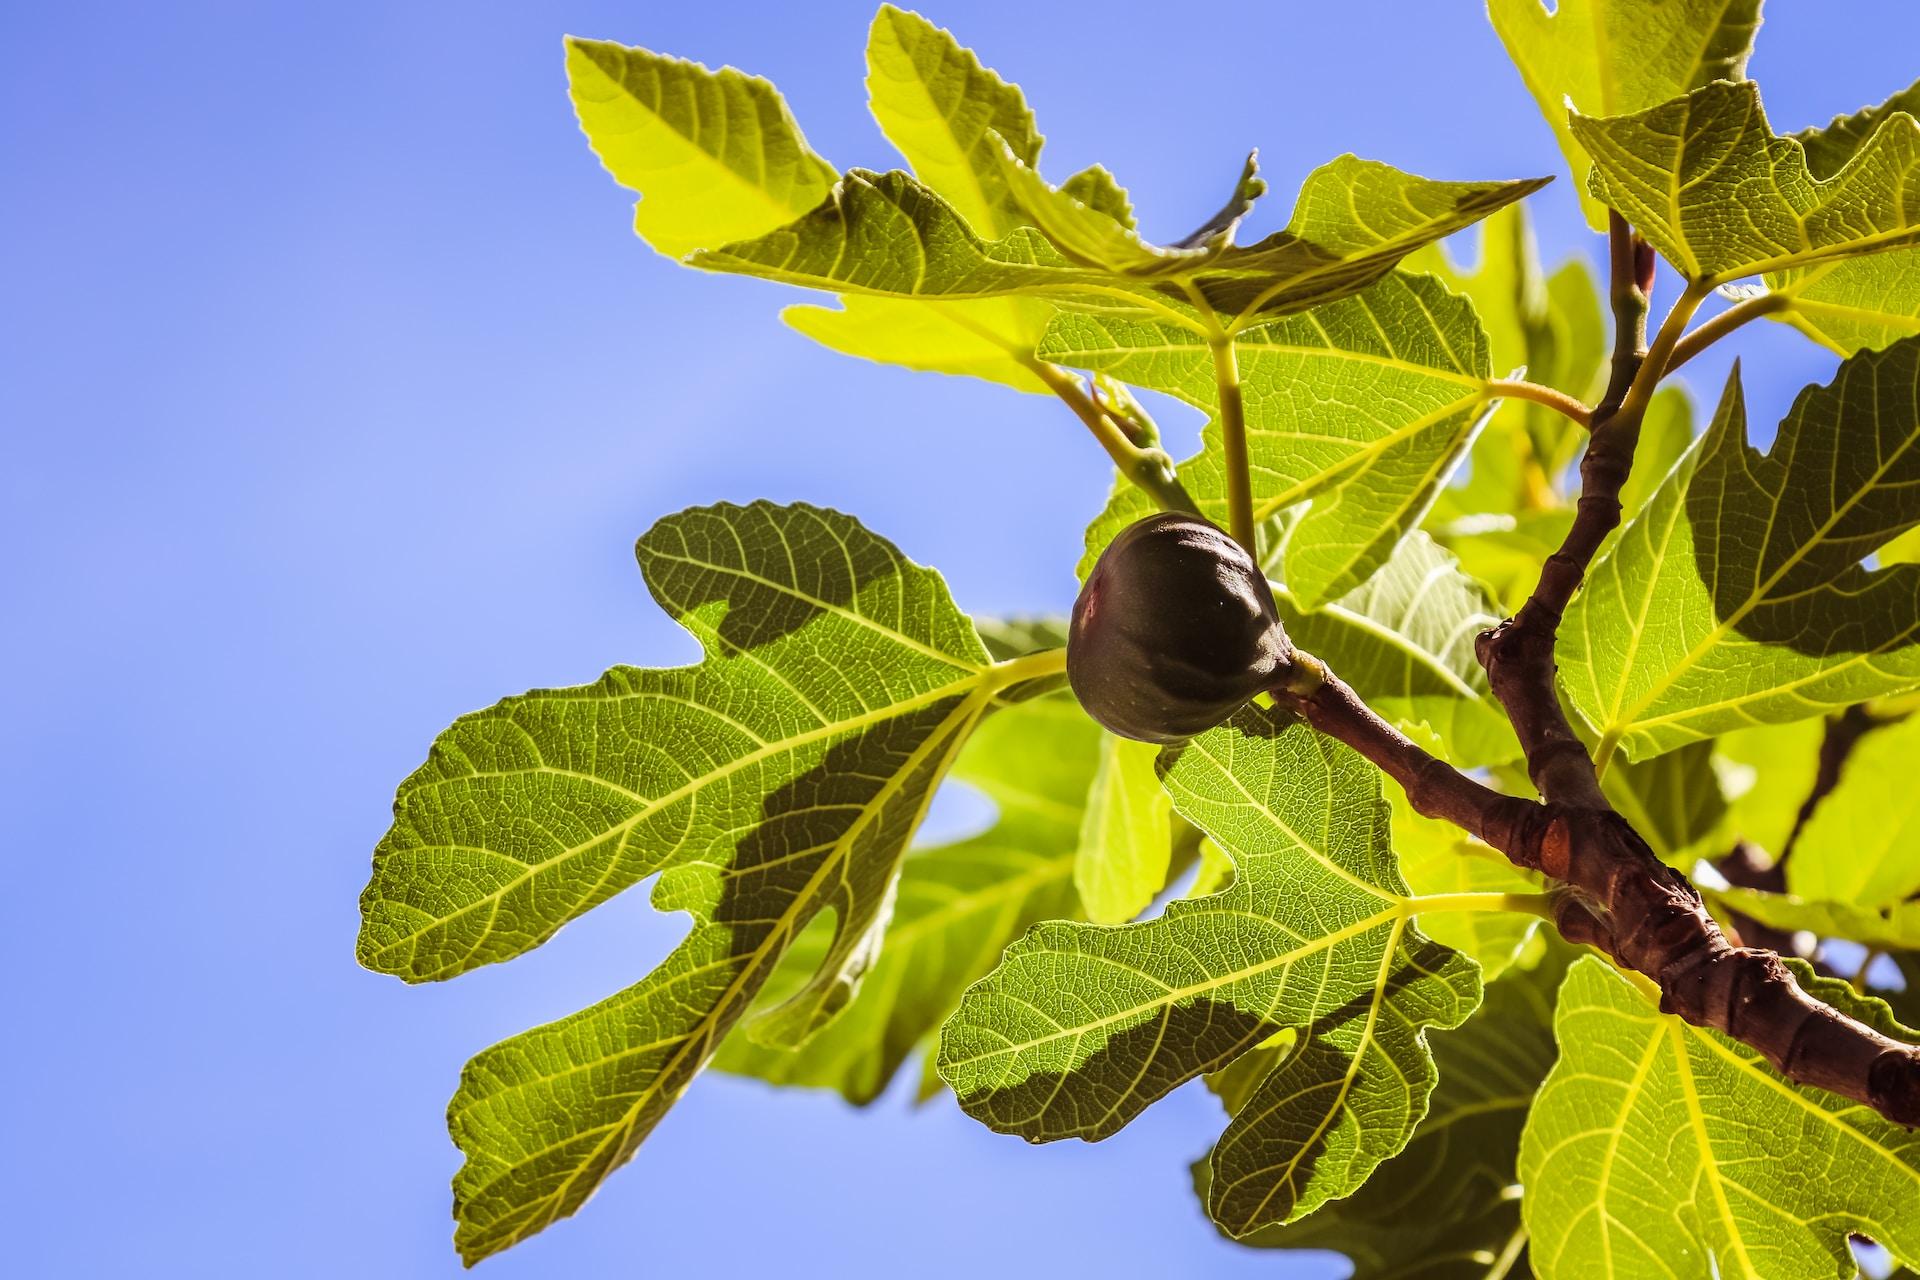 green leaf plant during daytime